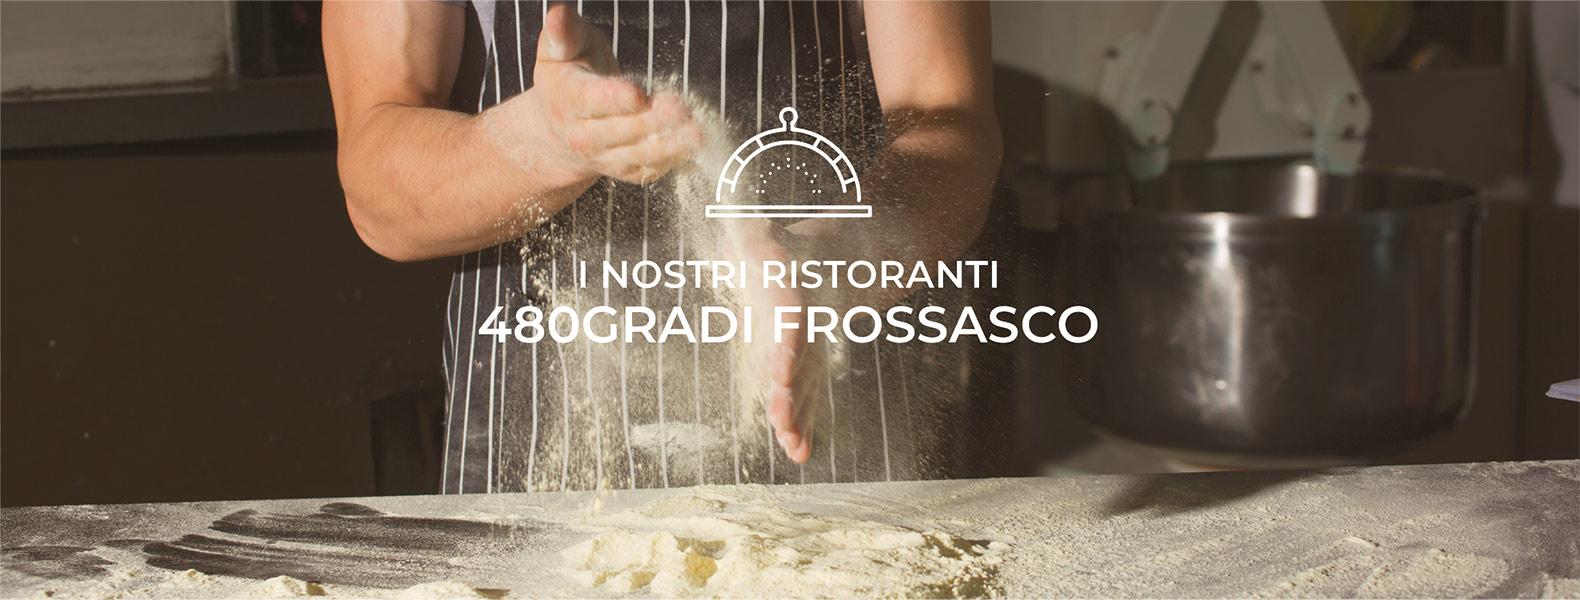 480Gradi Frossasco